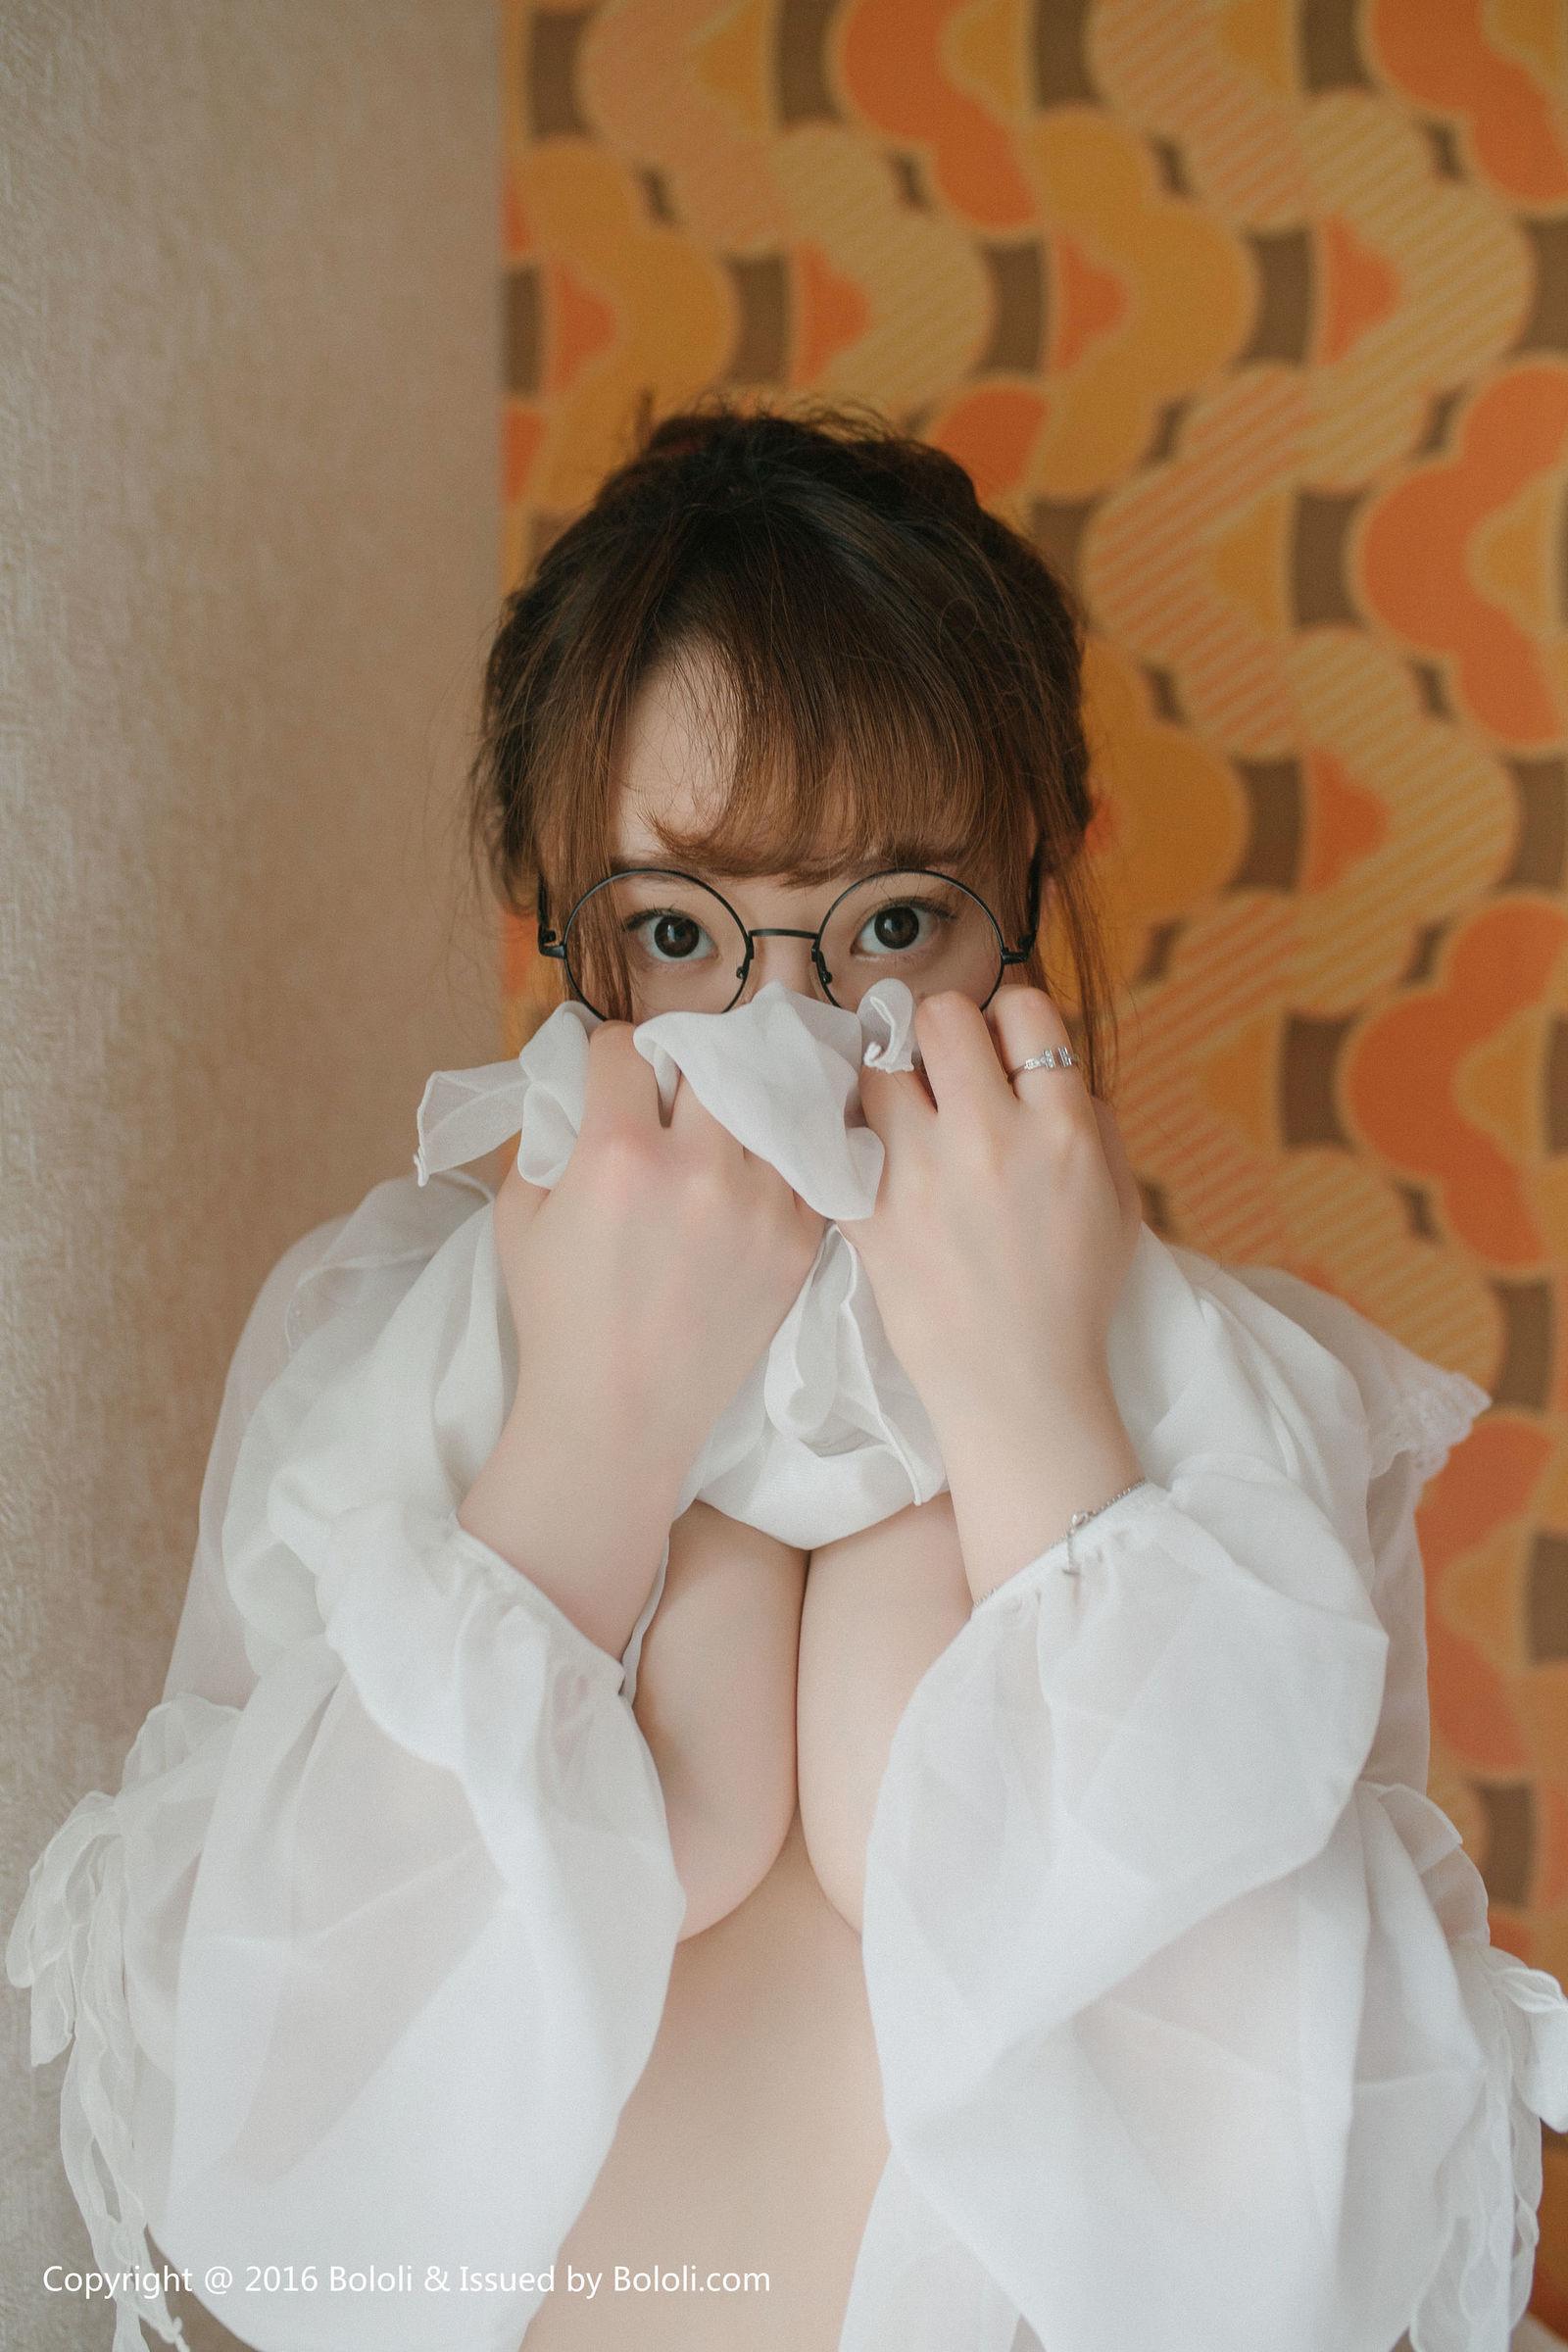 [Bololi波萝社] BOL.097 柳侑绮 - 七宝的哇卡伊日常 丝袜美图[65P]